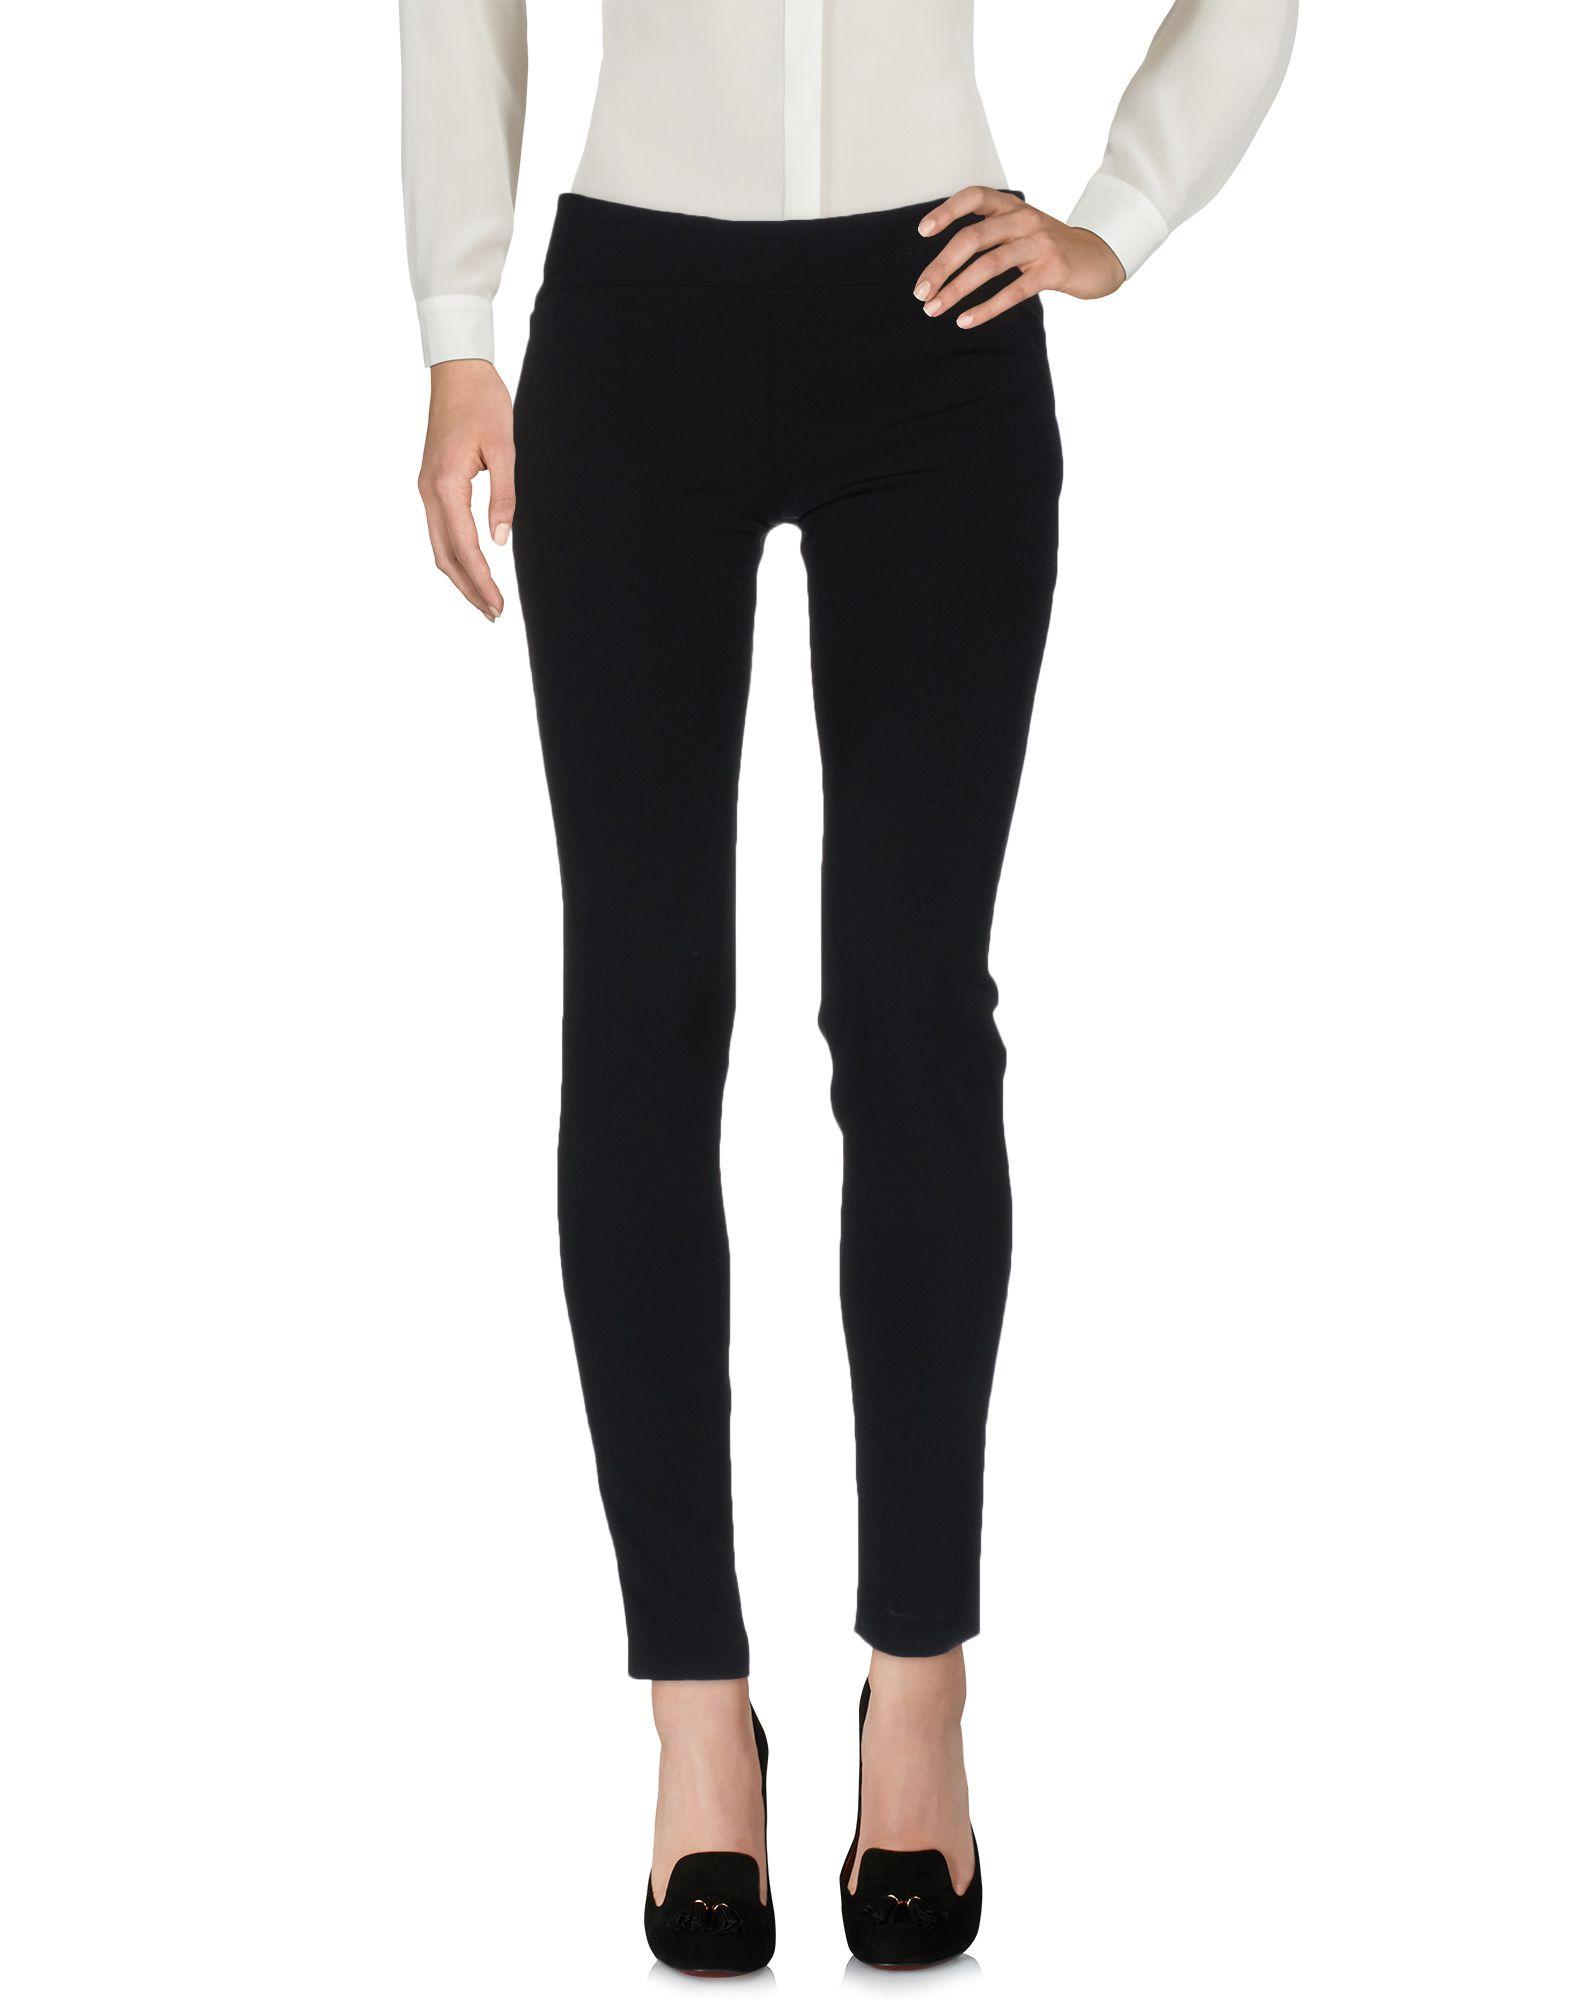 Pantalone Violet Atos Lombardini Donna - Acquista online su 01kP4